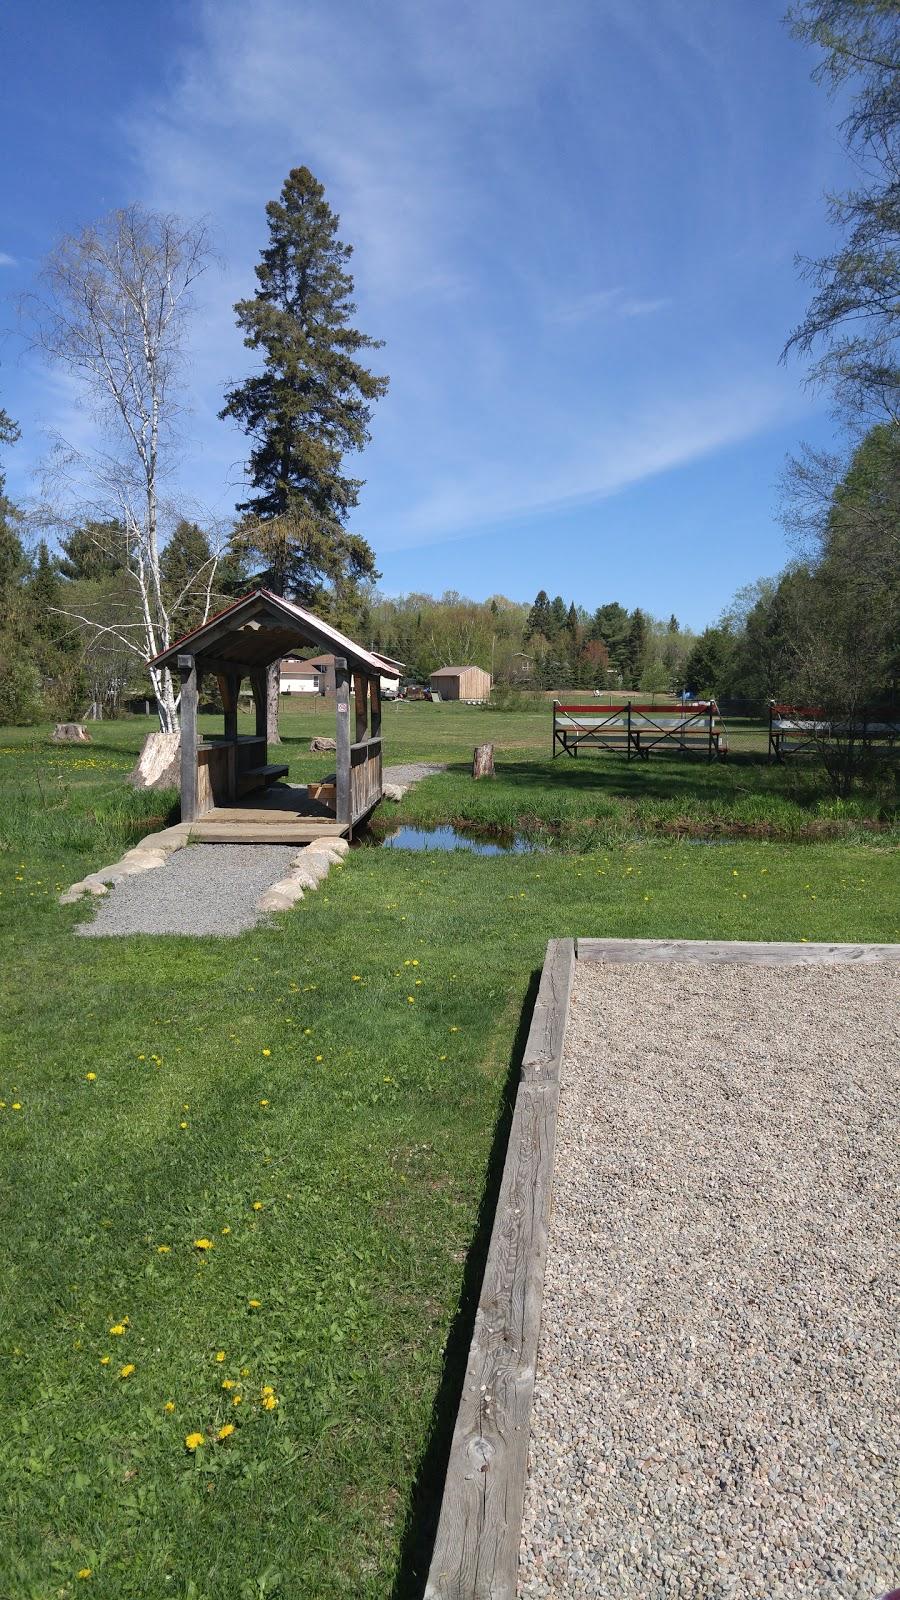 Novar Community Ctr   point of interest   25 Laurie St, Novar, ON P0A 1R0, Canada   7057887422 OR +1 705-788-7422